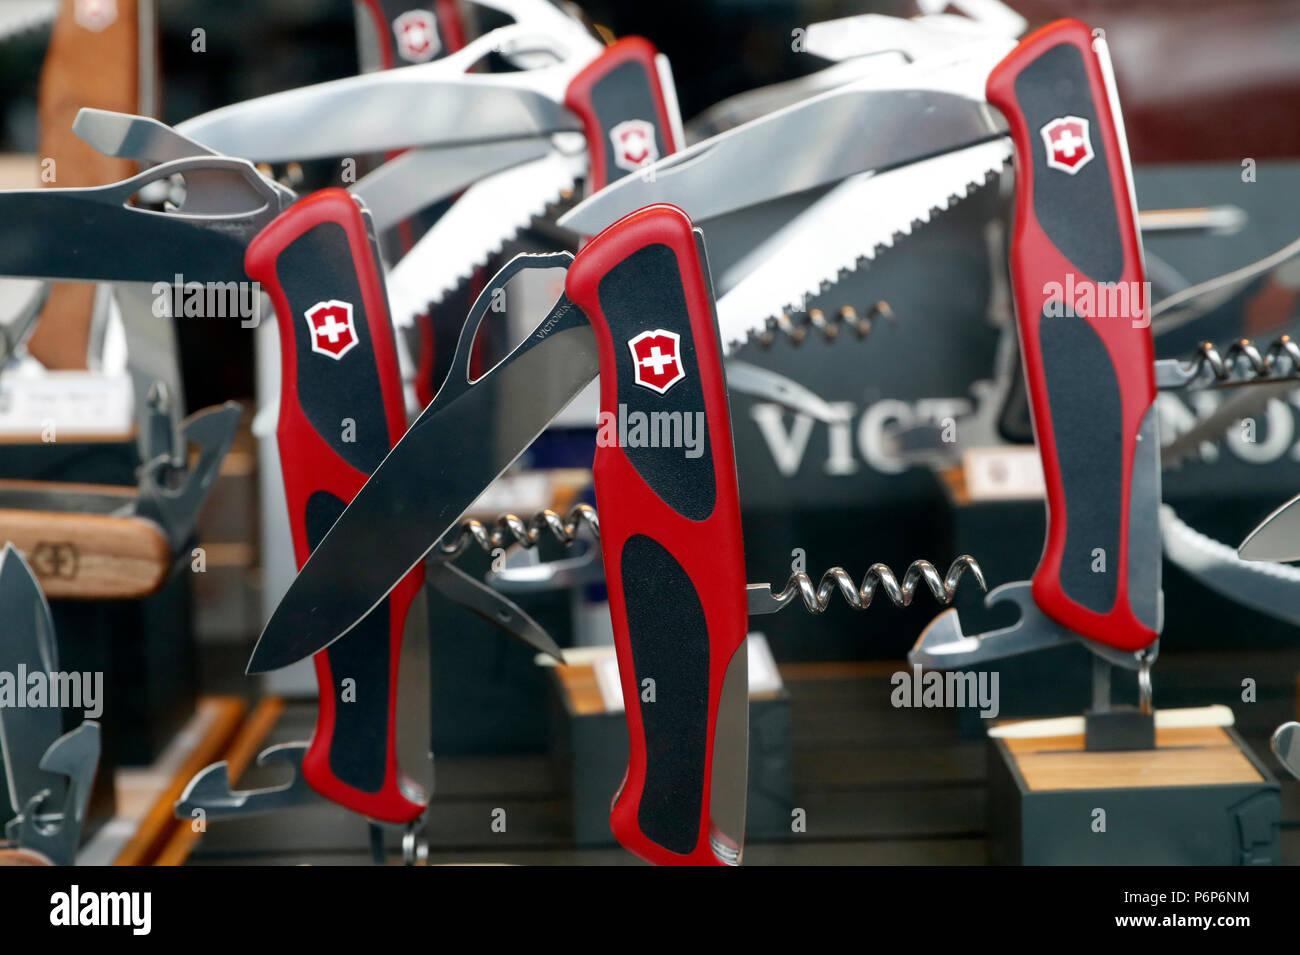 Victorinox swiss army knifes for sale.  Geneva. Switzerland. - Stock Image